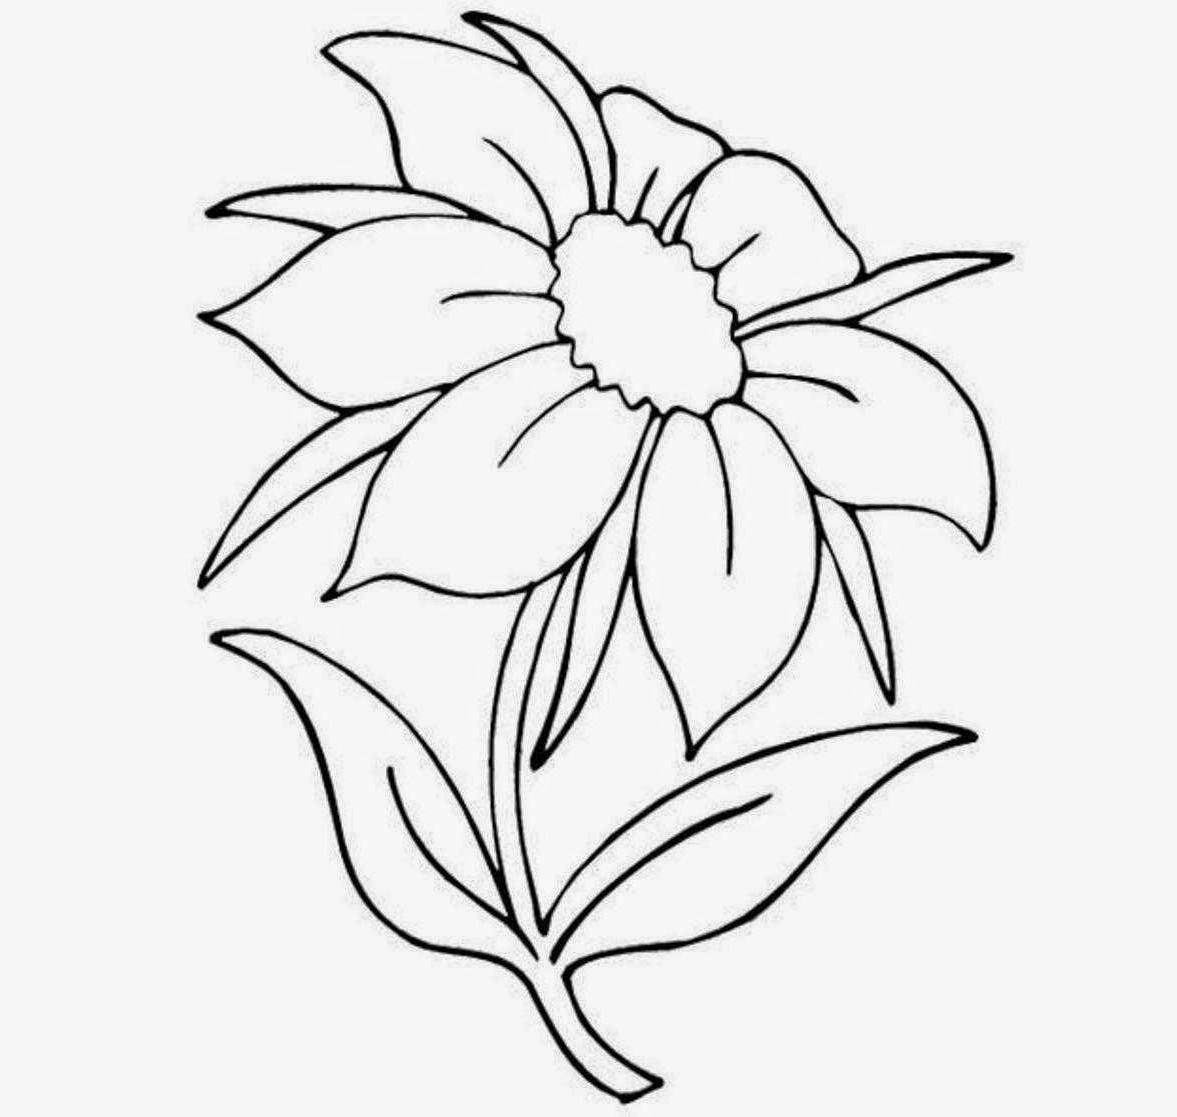 1177x1117 Inspiring Idea Easy Flower To Draw How Draw Simple Cartoon Flower